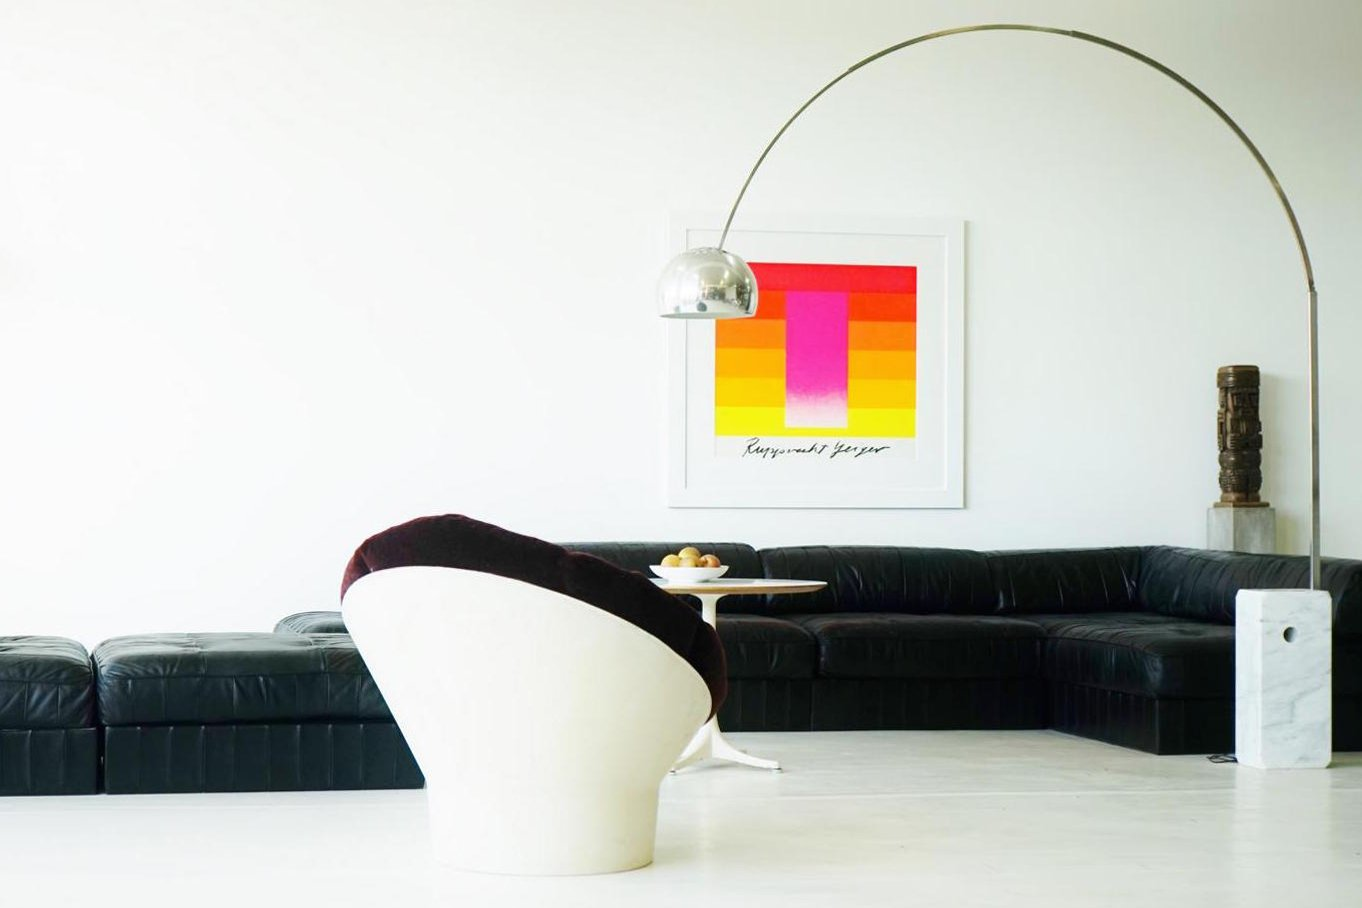 spotlight space age-inspired designs—pamono stories